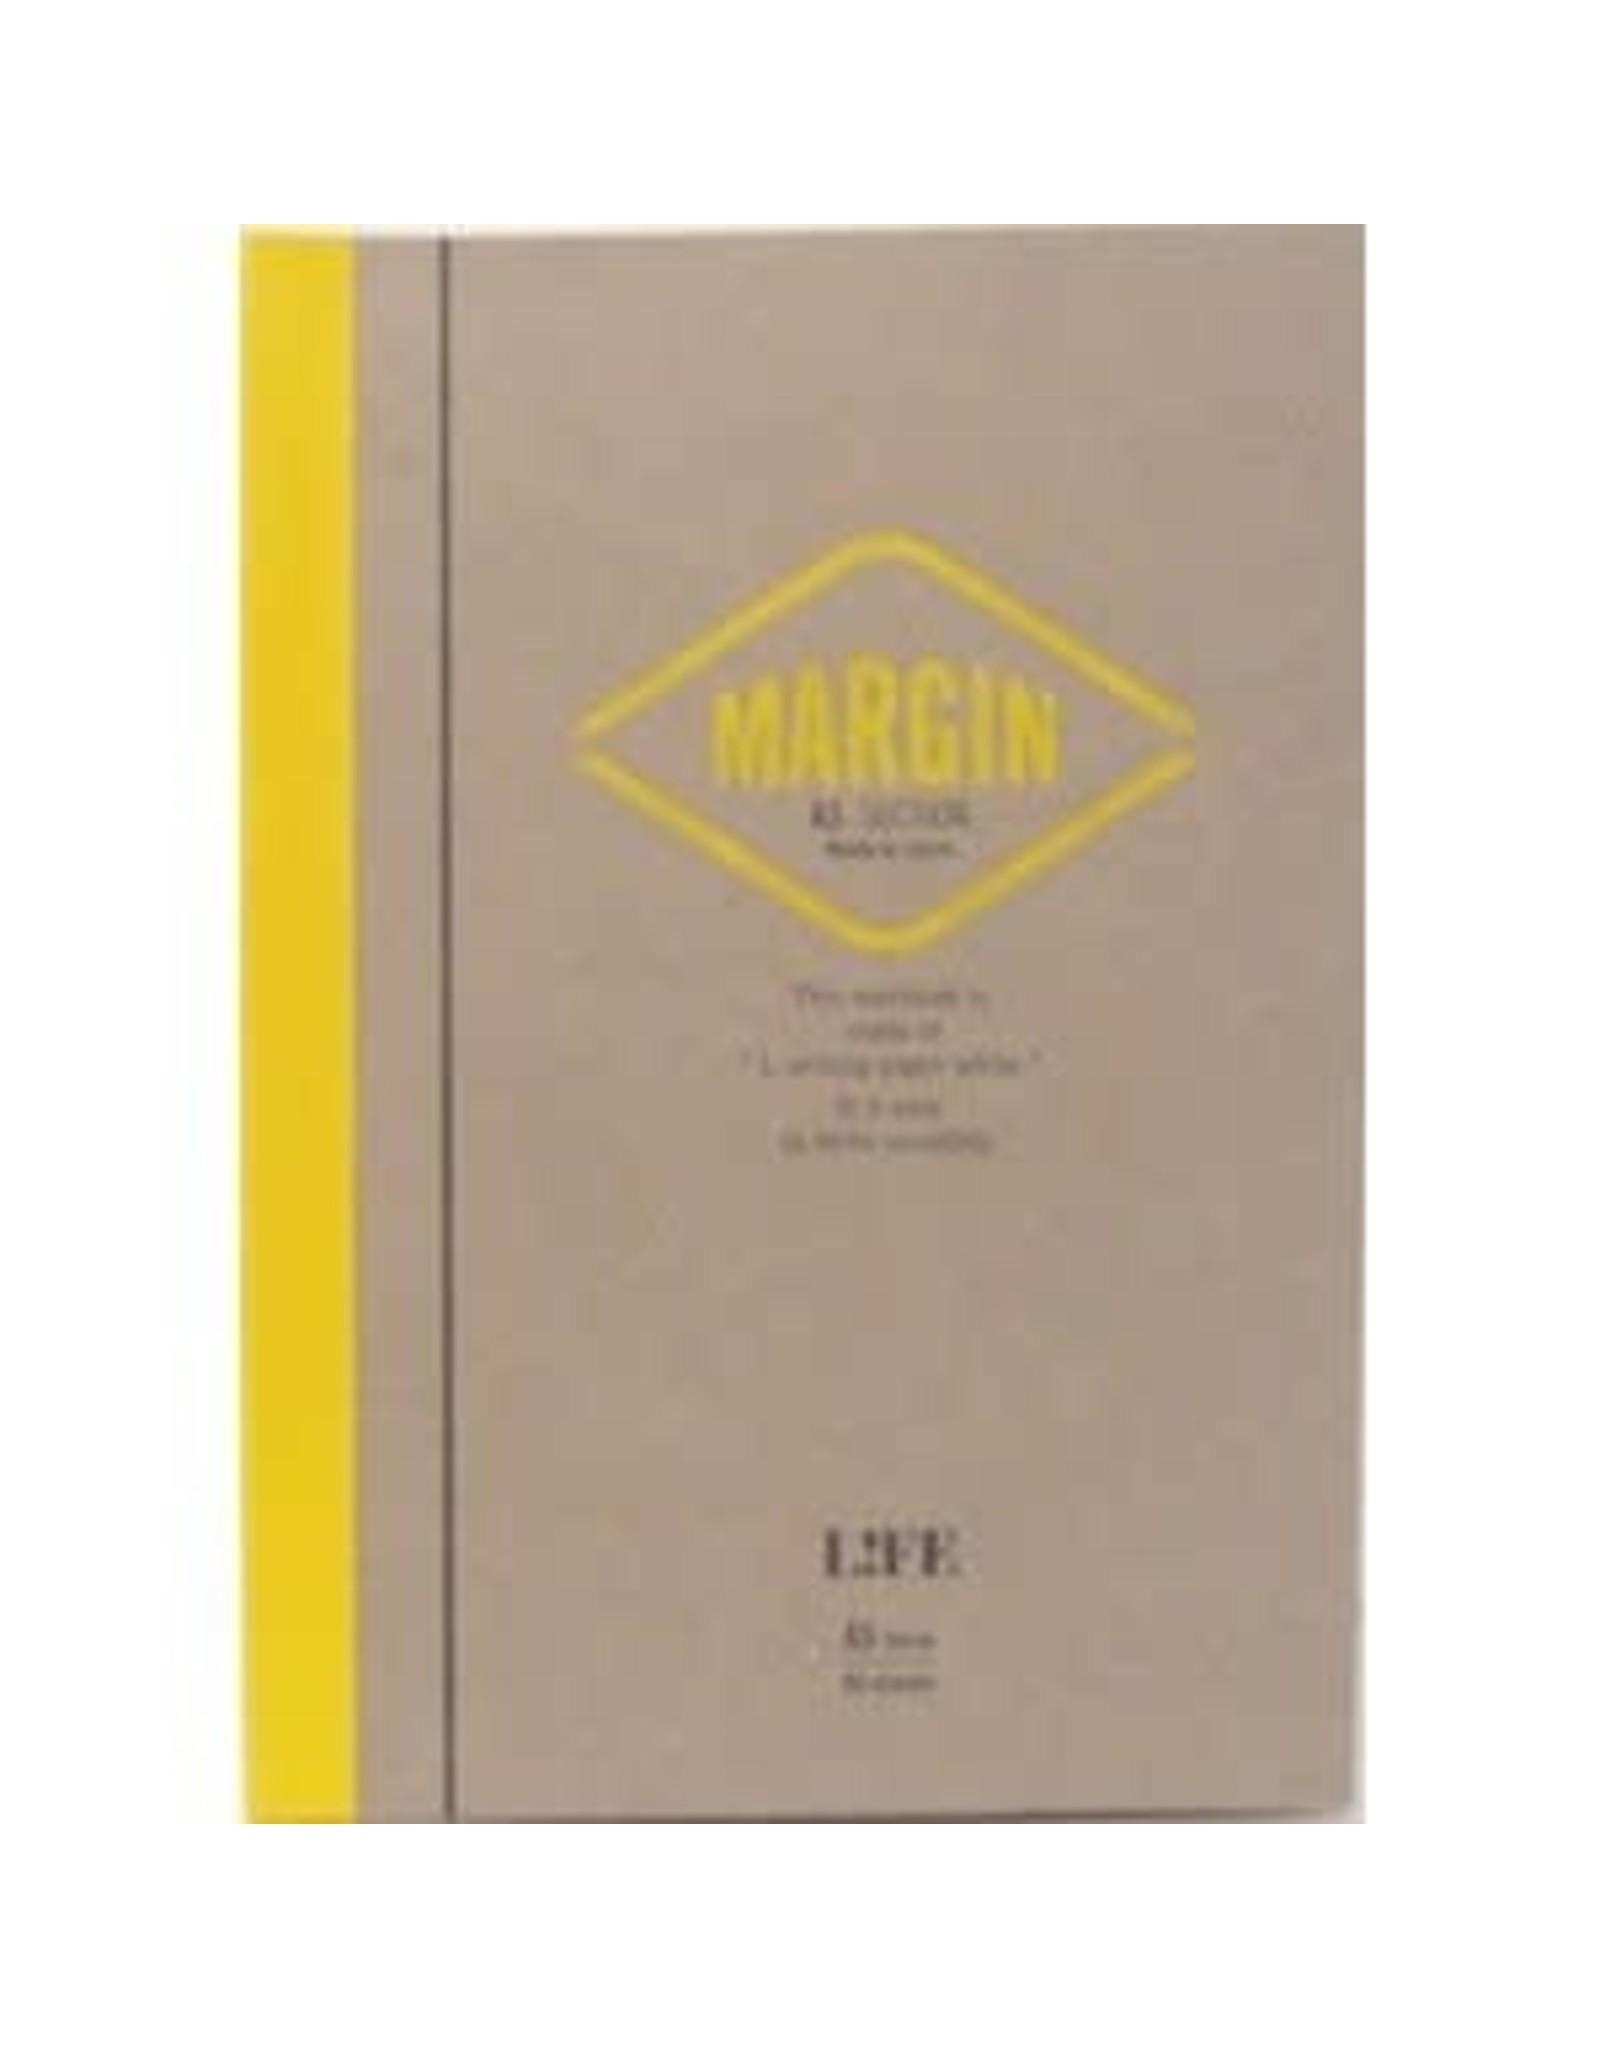 LIFE CO.,LTD. MARGIN NOTE A5 GRID